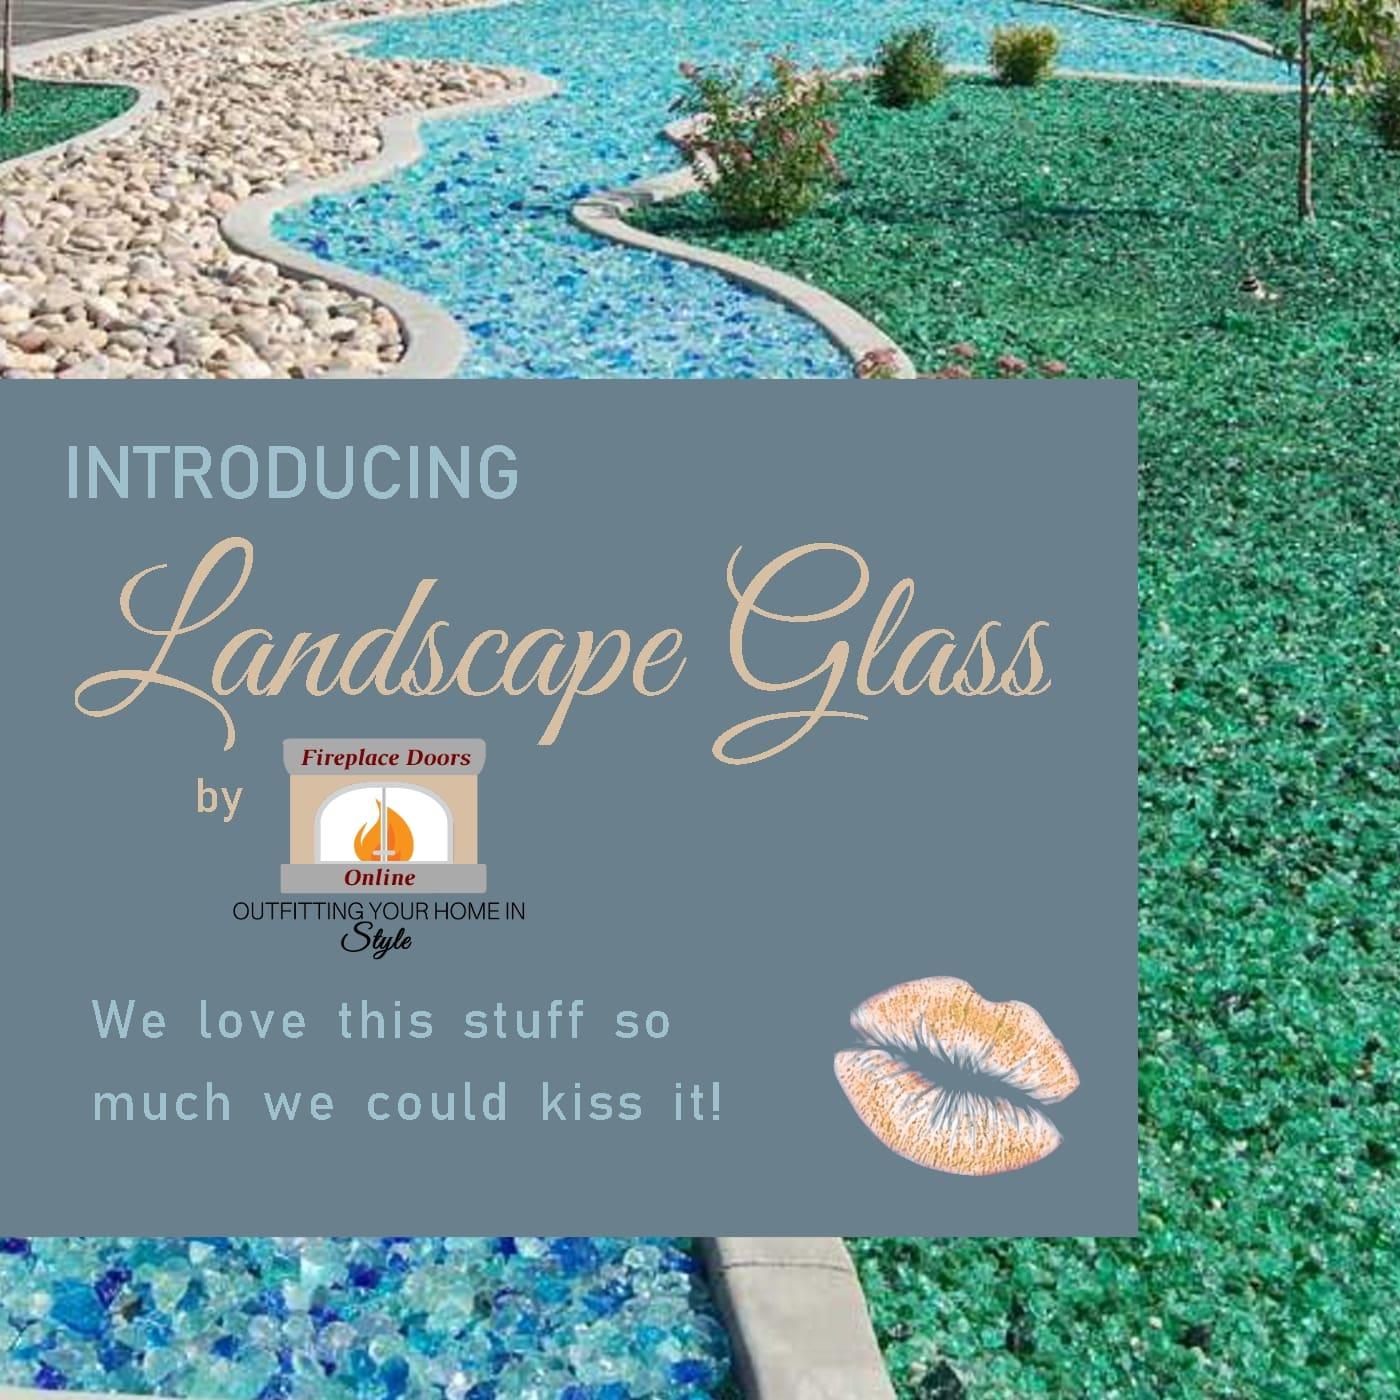 Introducing: Landscape Glass!